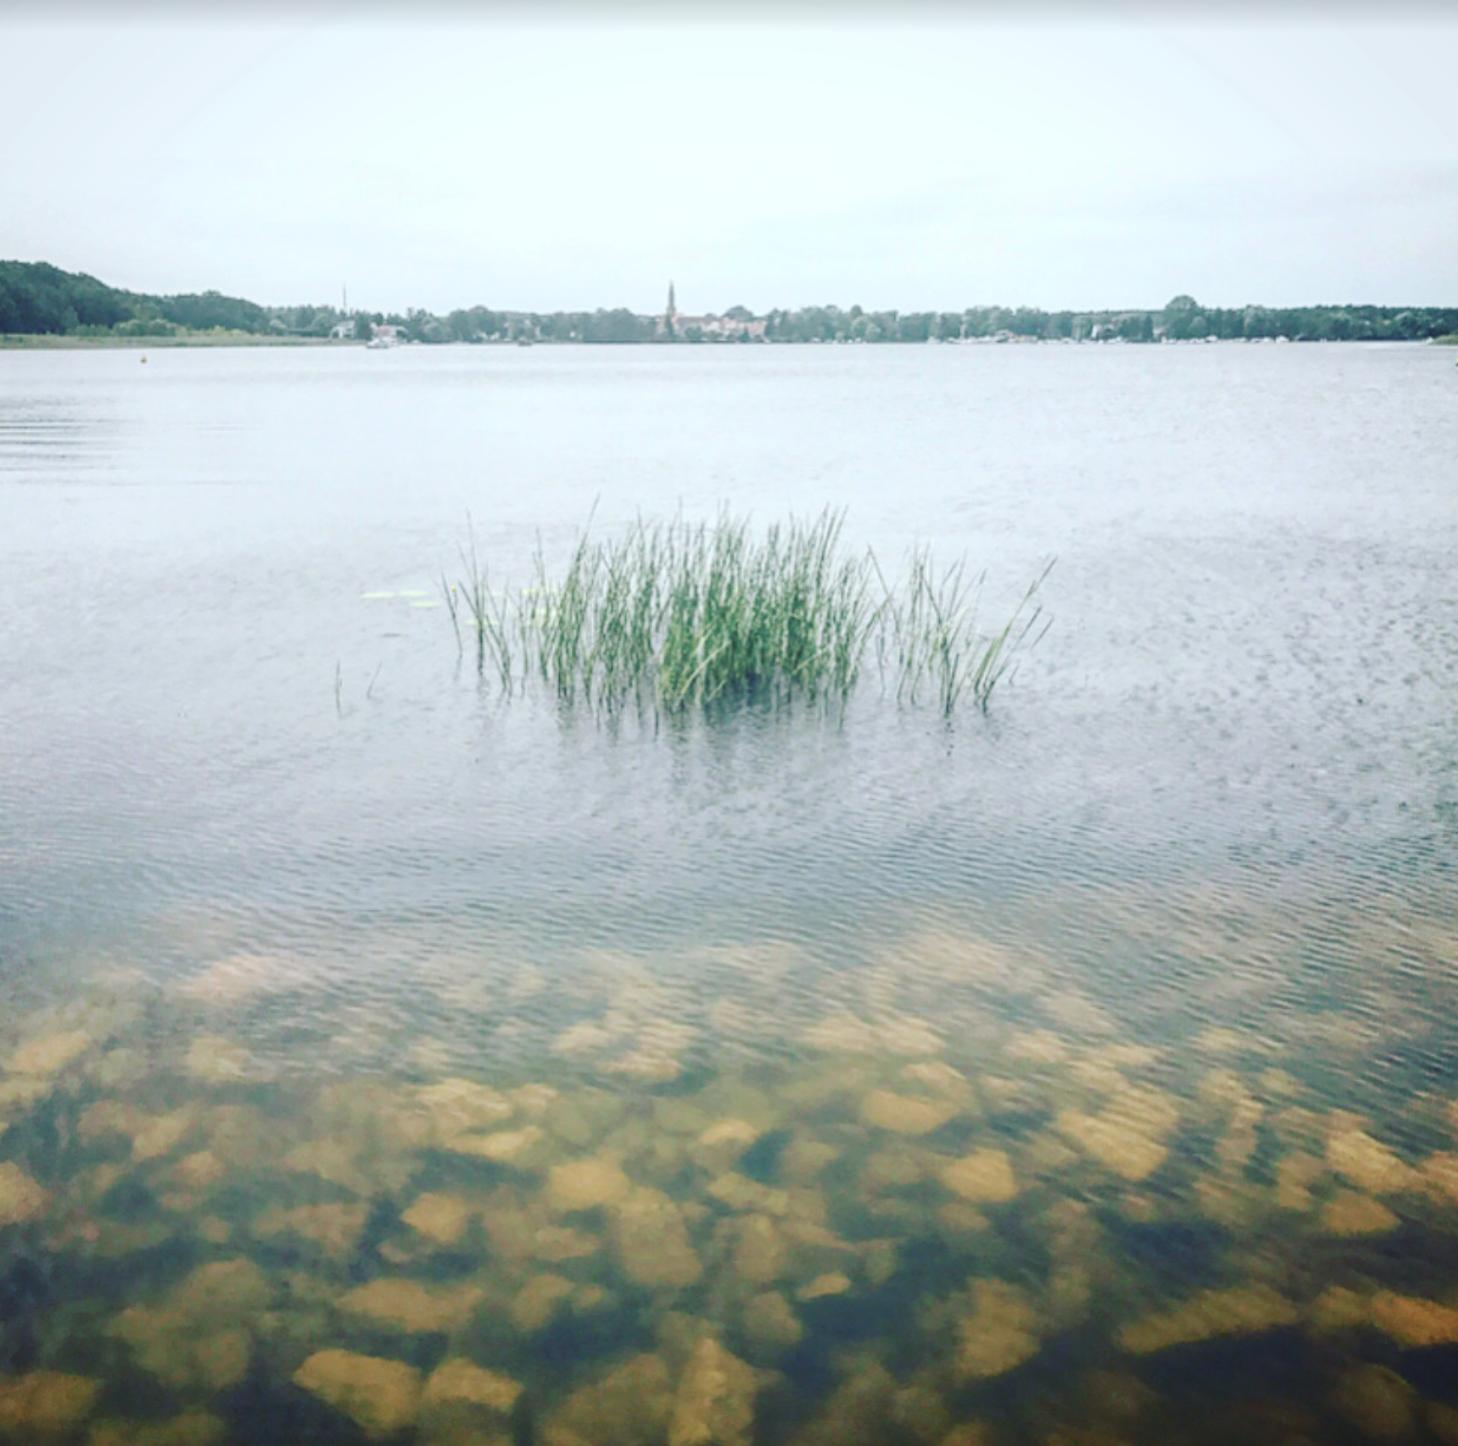 ravensbrück and the schwedtsee